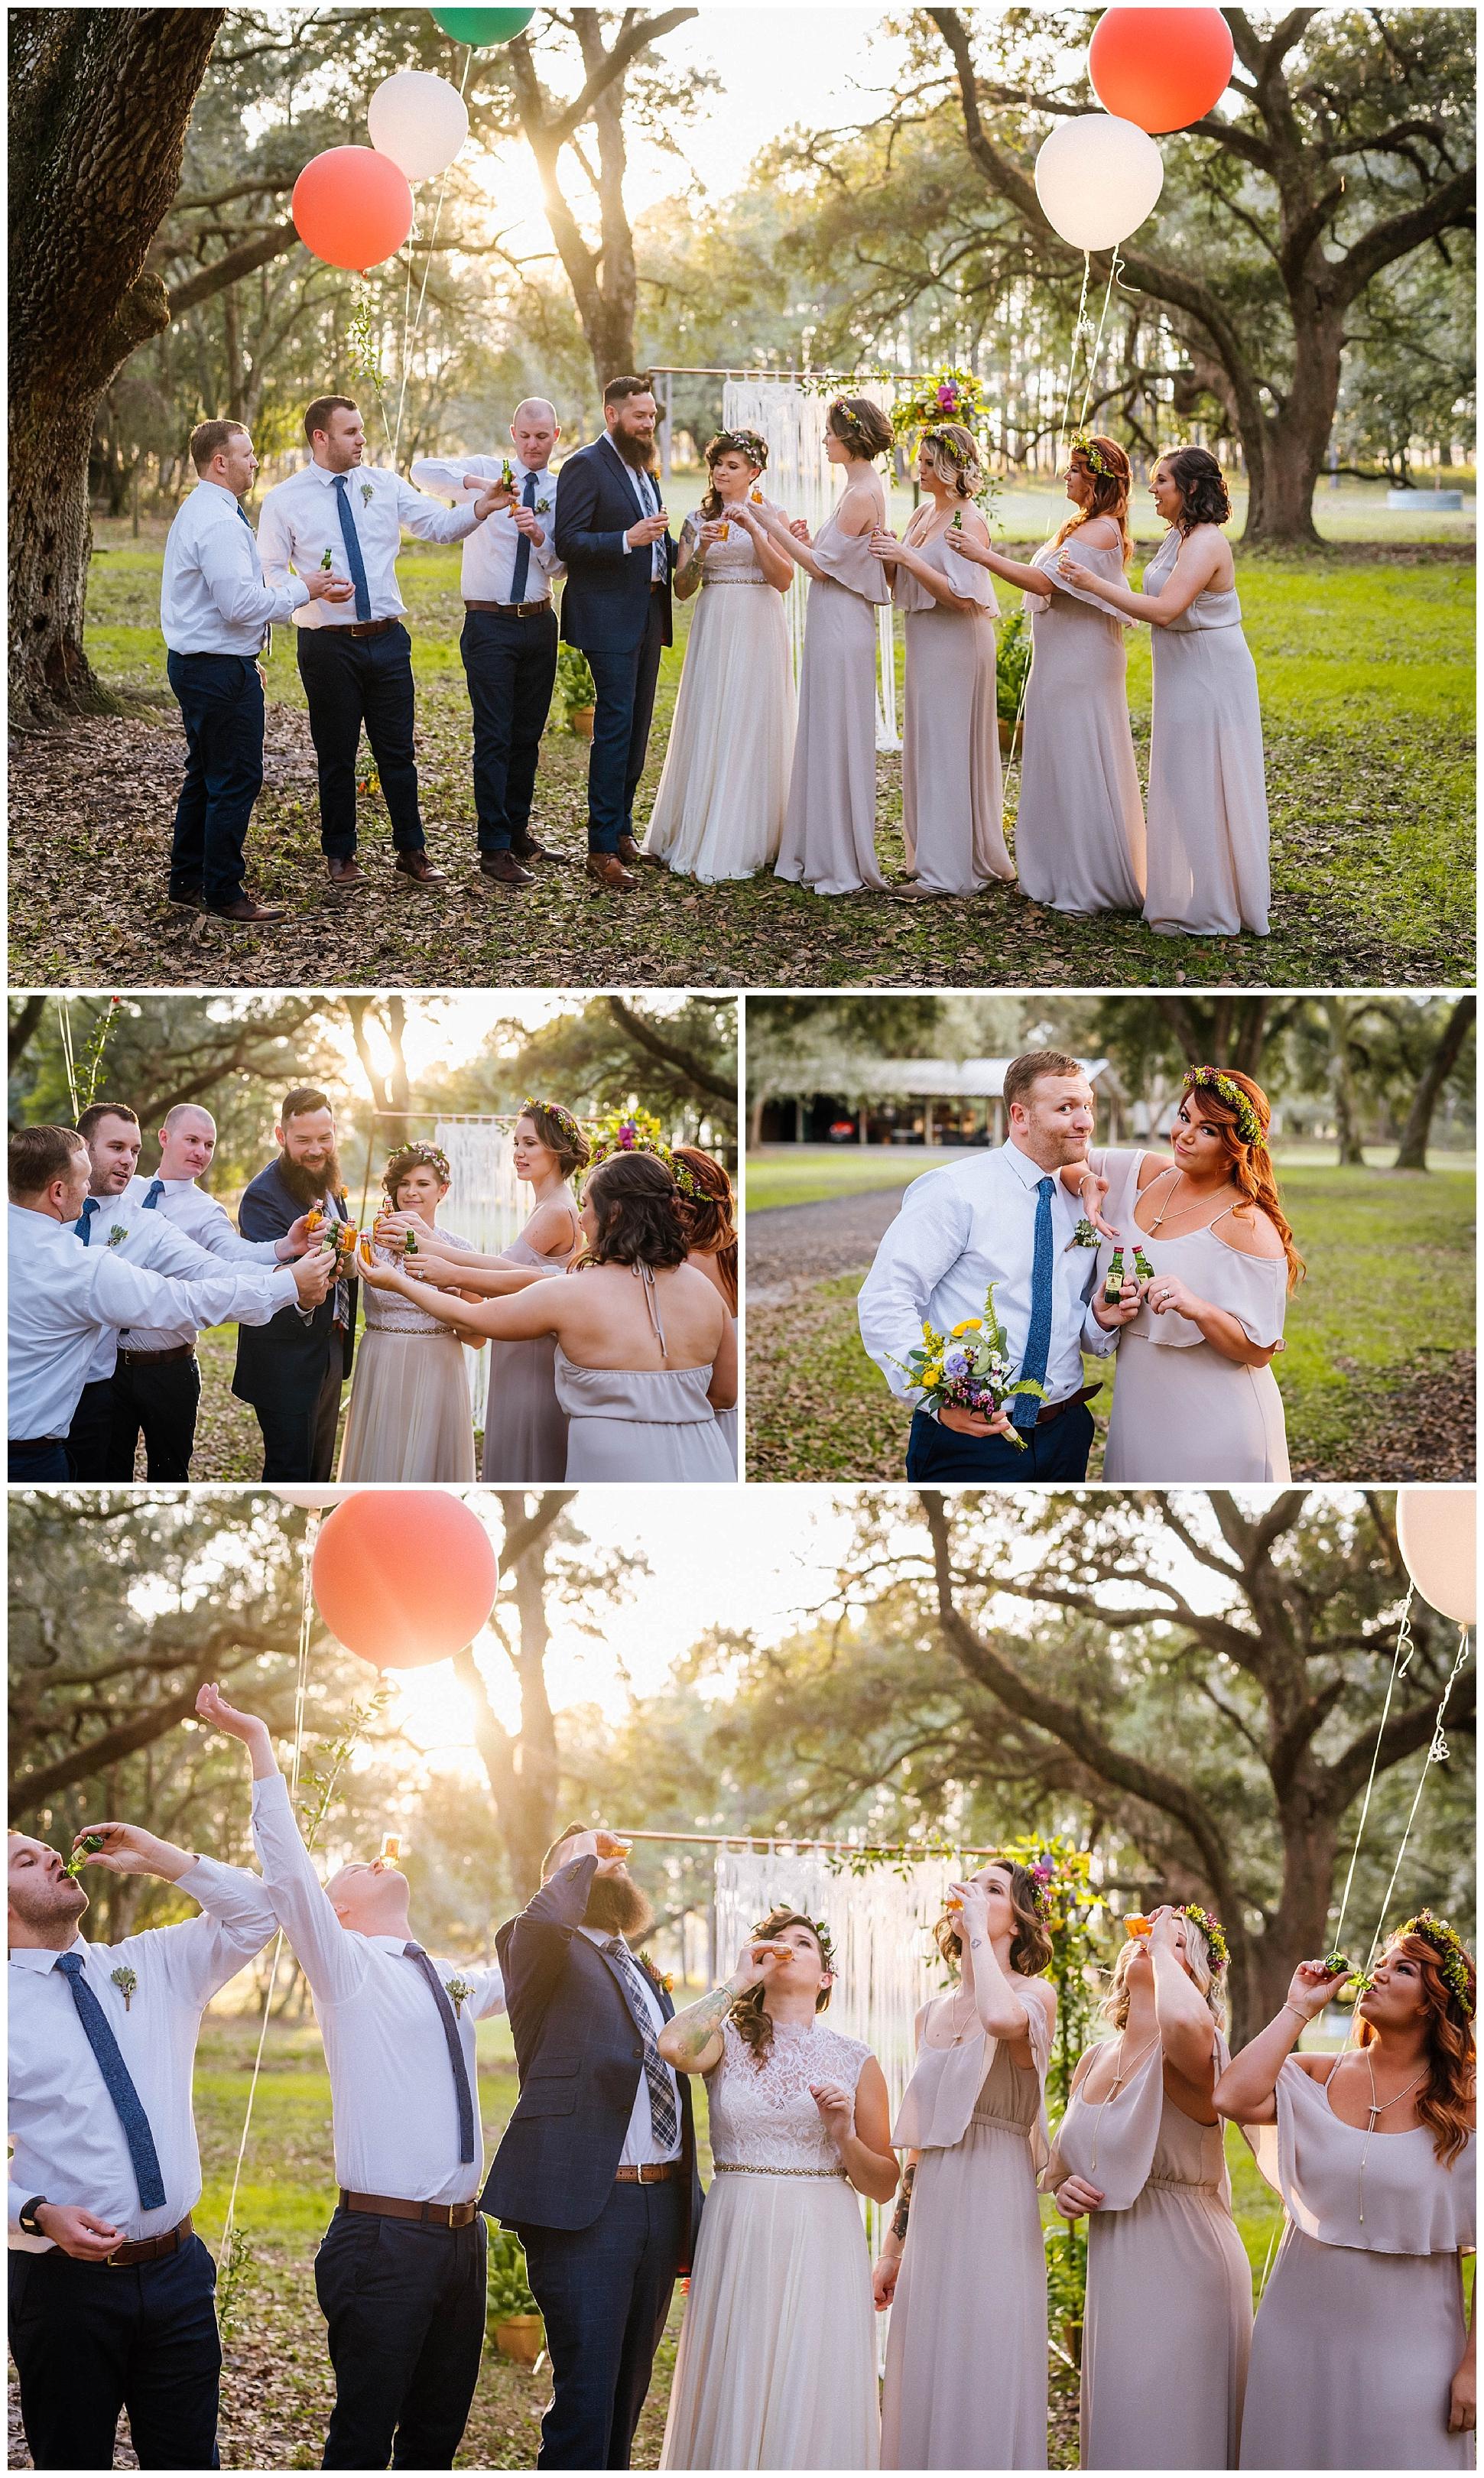 magical-outdoor-florida-wedding-smoke-bombs-flowers-crown-beard_0043.jpg